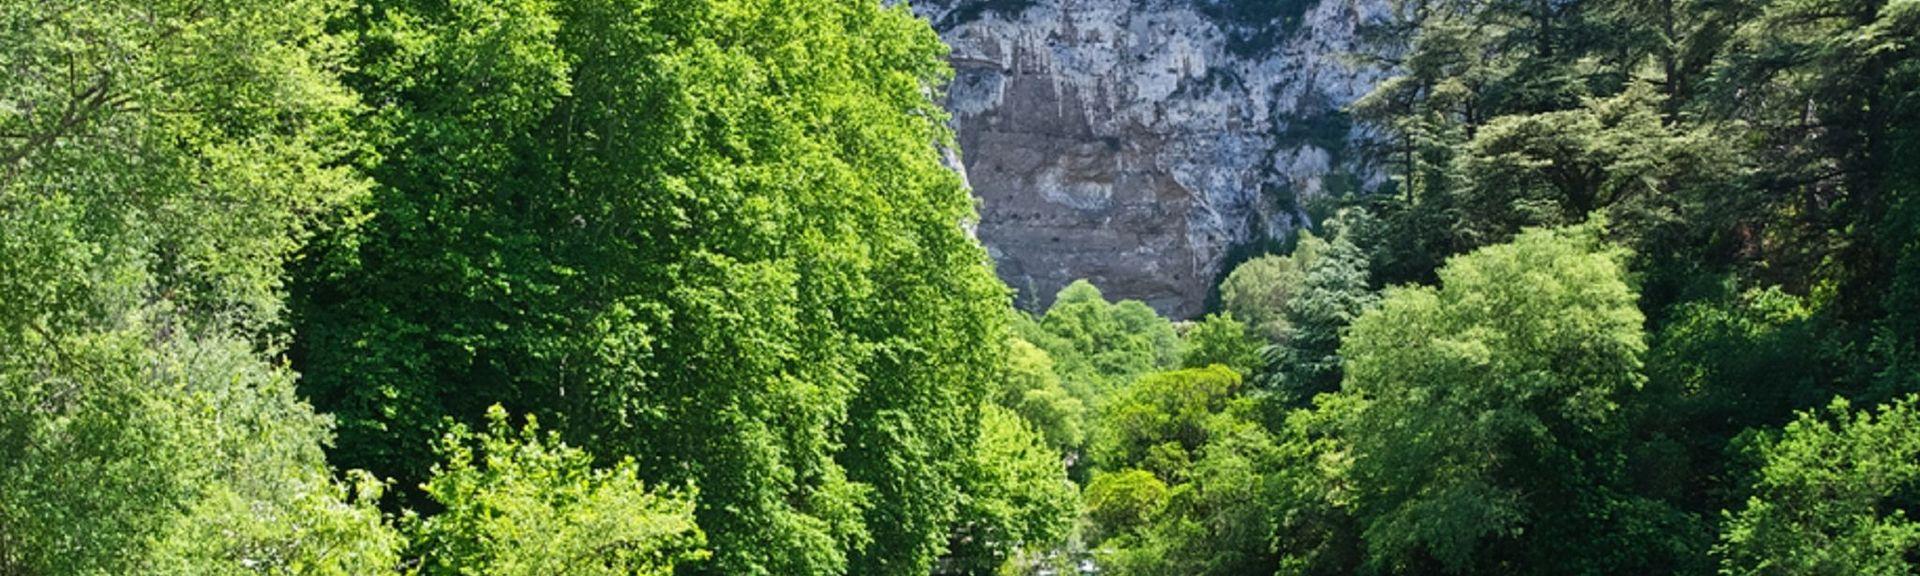 Cheval-Blanc, Provence-Alpes-Côte d'Azur, Frankrijk